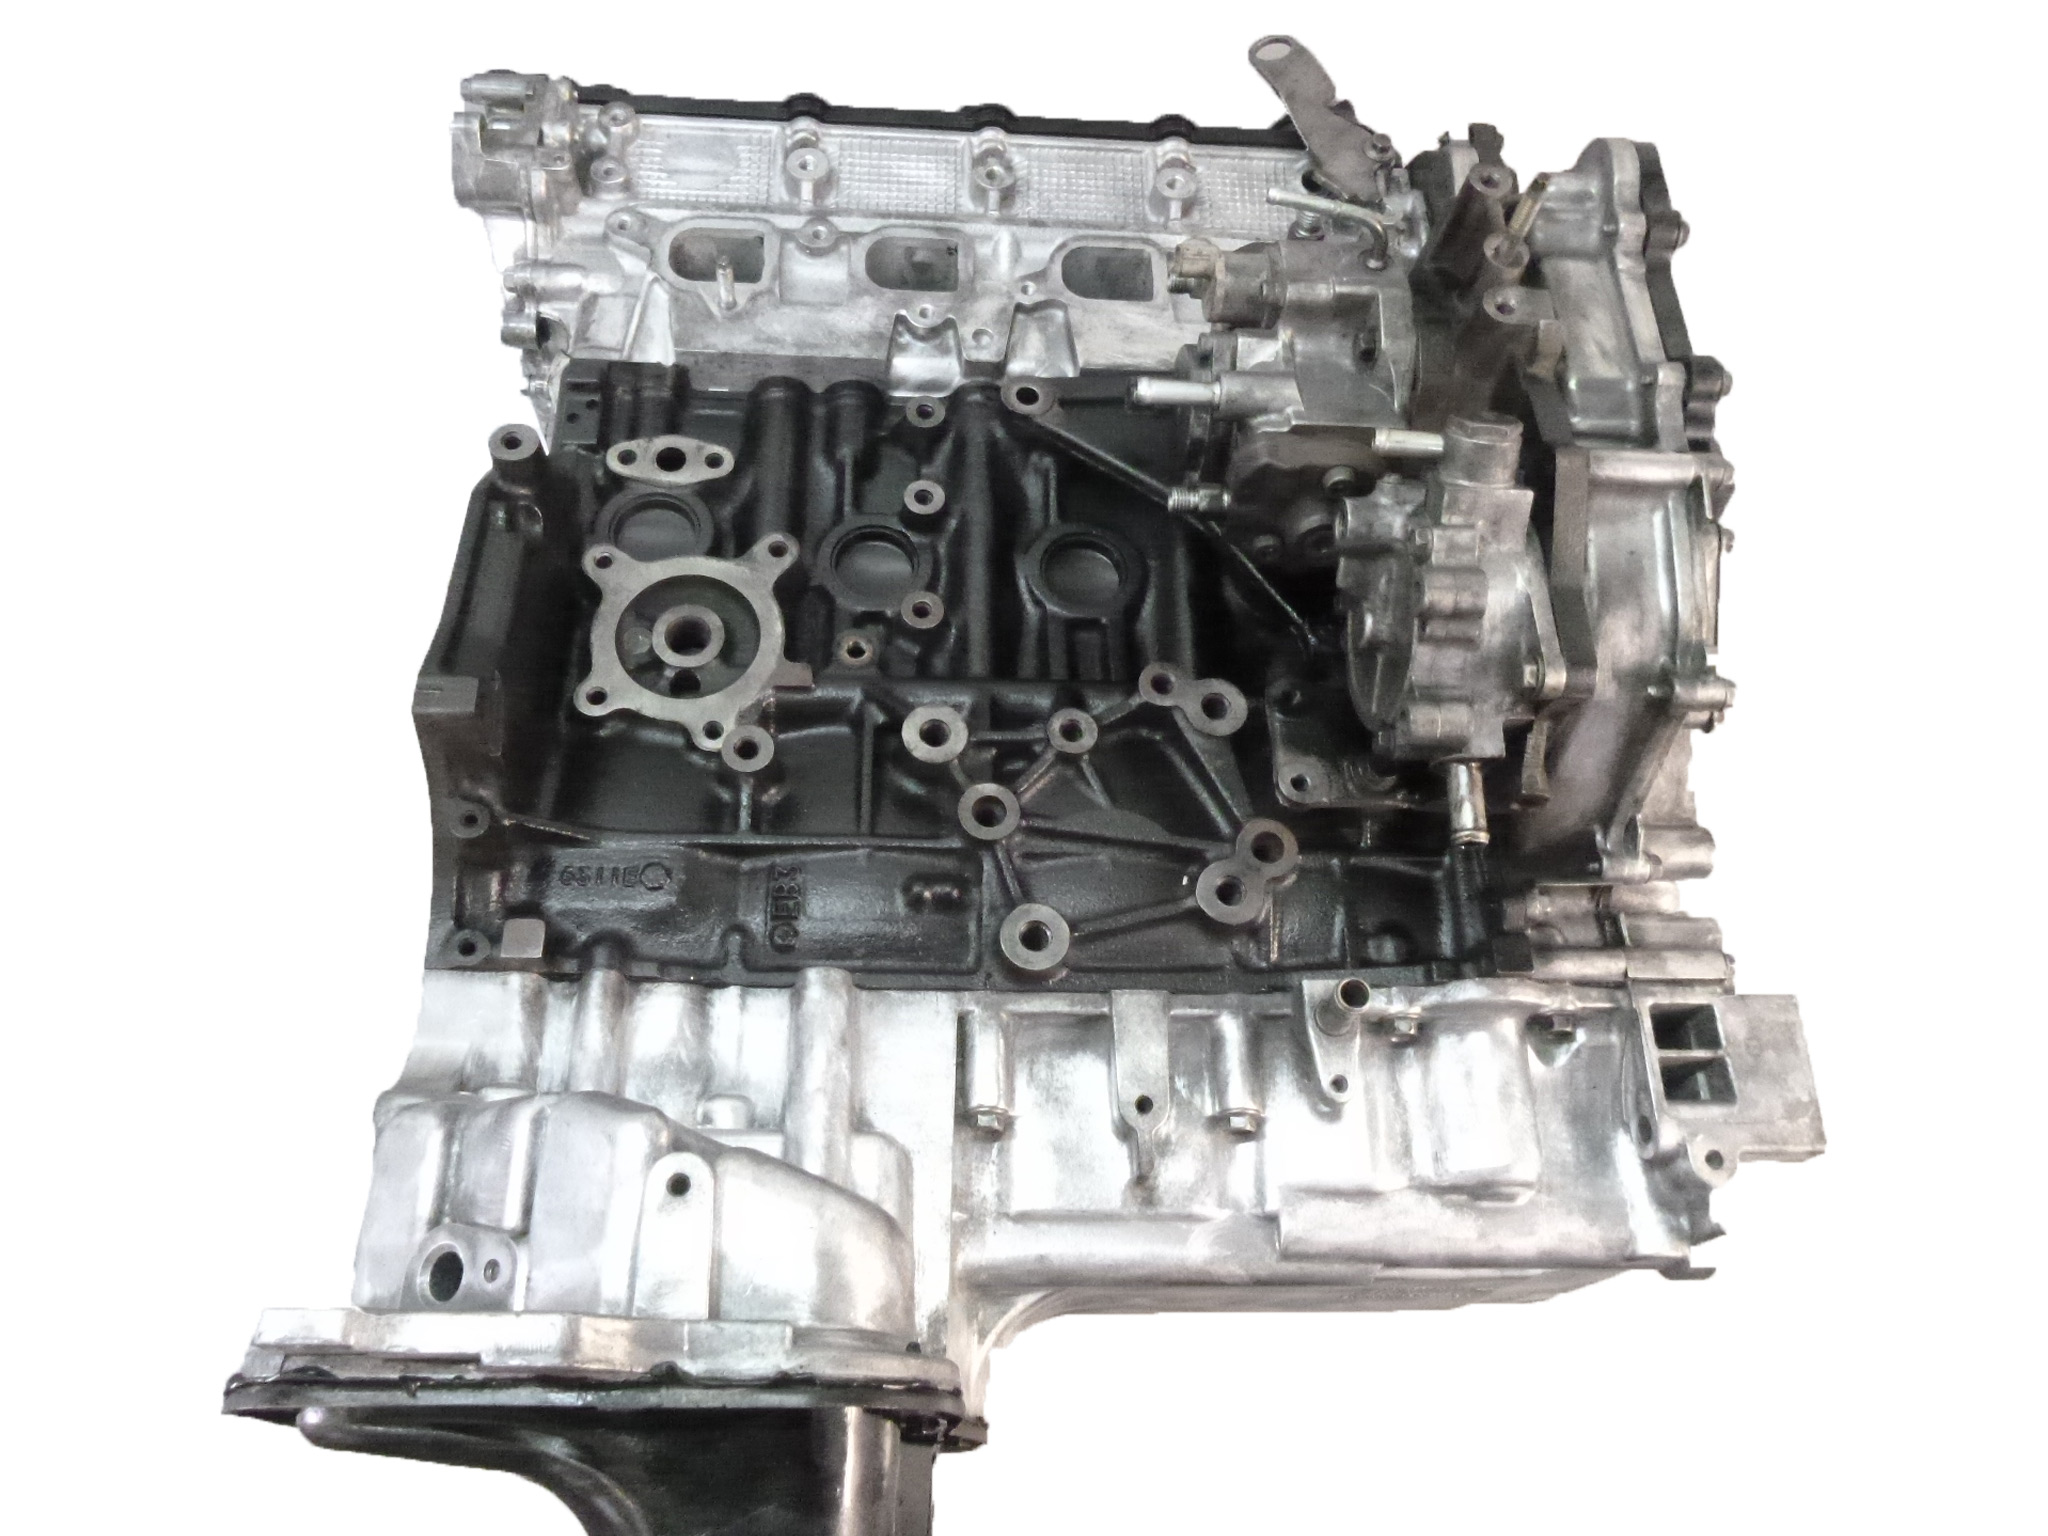 Motor für Nissan Navara NP300 2,5 dCi YD25DDTI